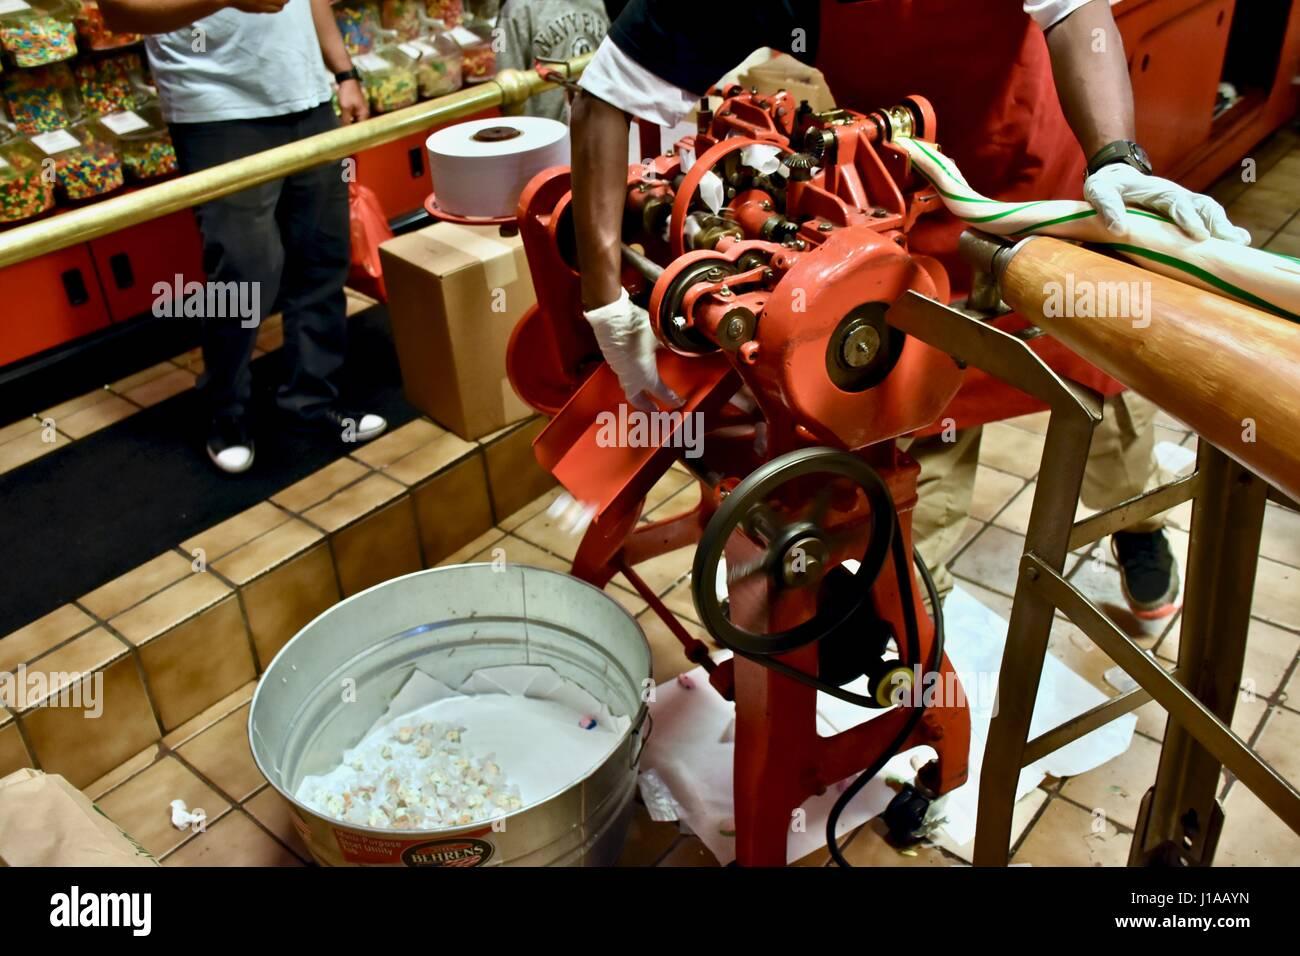 Making salt water taffy at the Savannah Candy Kitchen Stock Photo ...